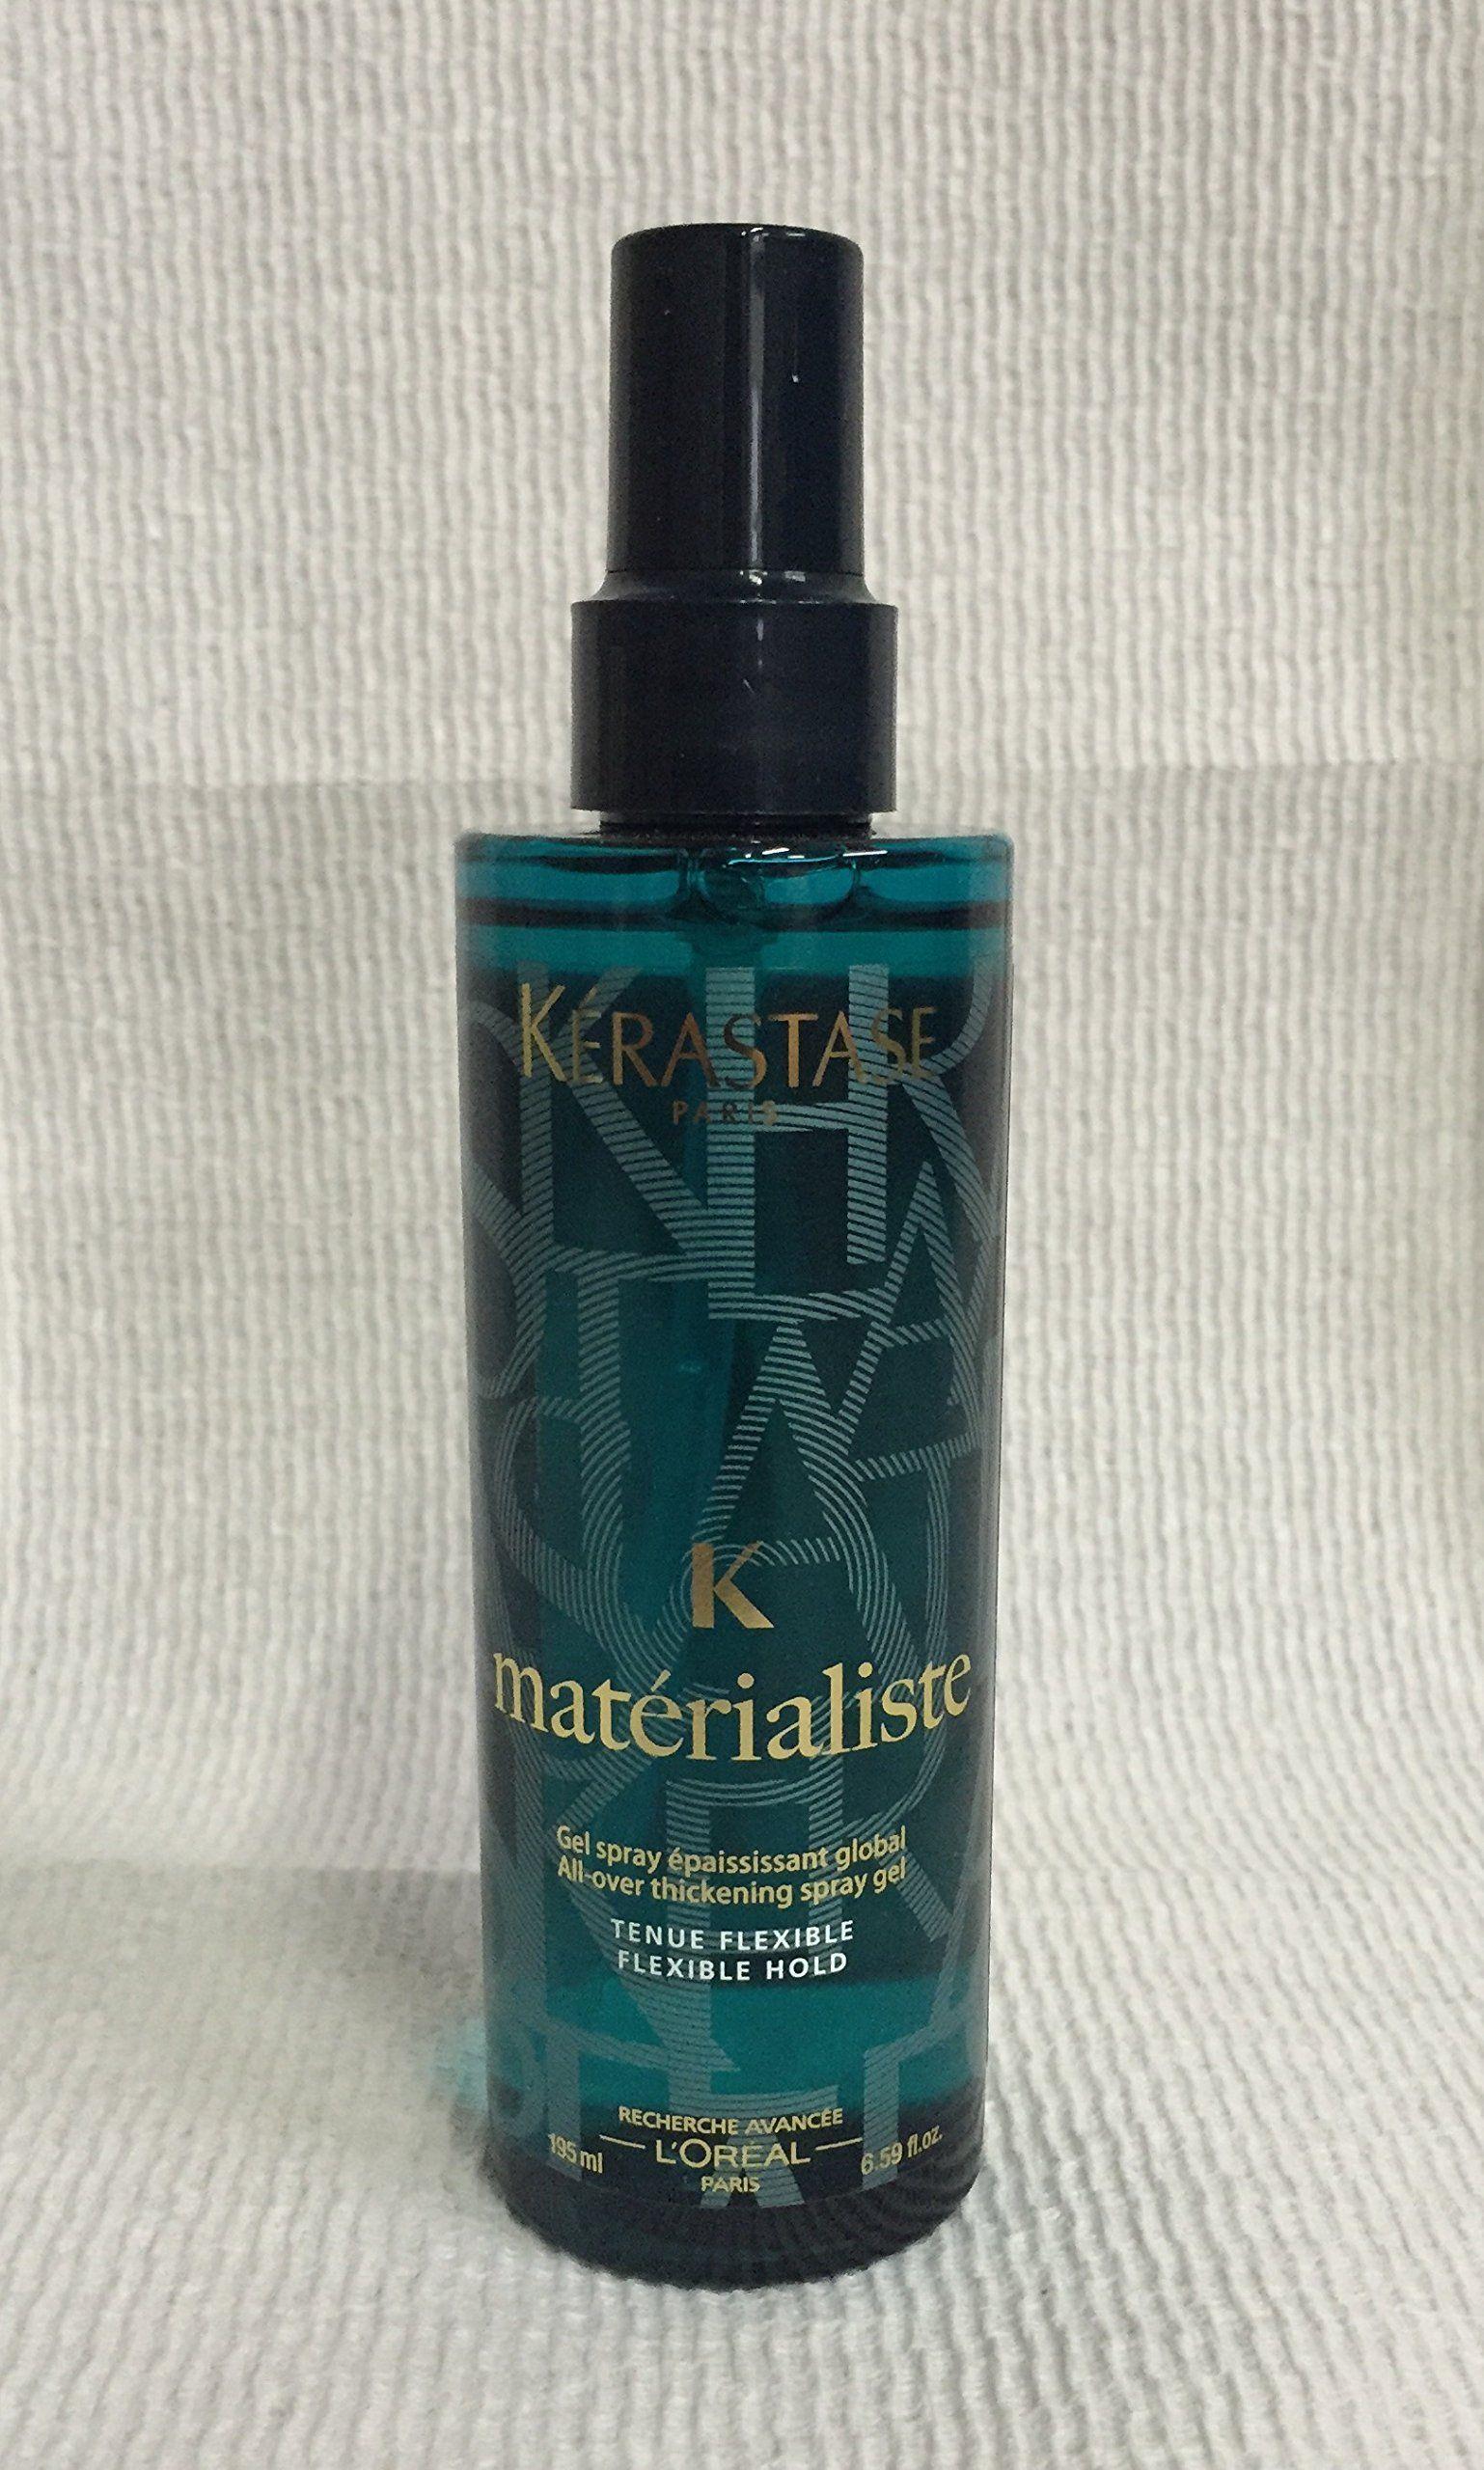 Kerastase Materialiste Gel Spray 6.59 oz Kerastase, Spray